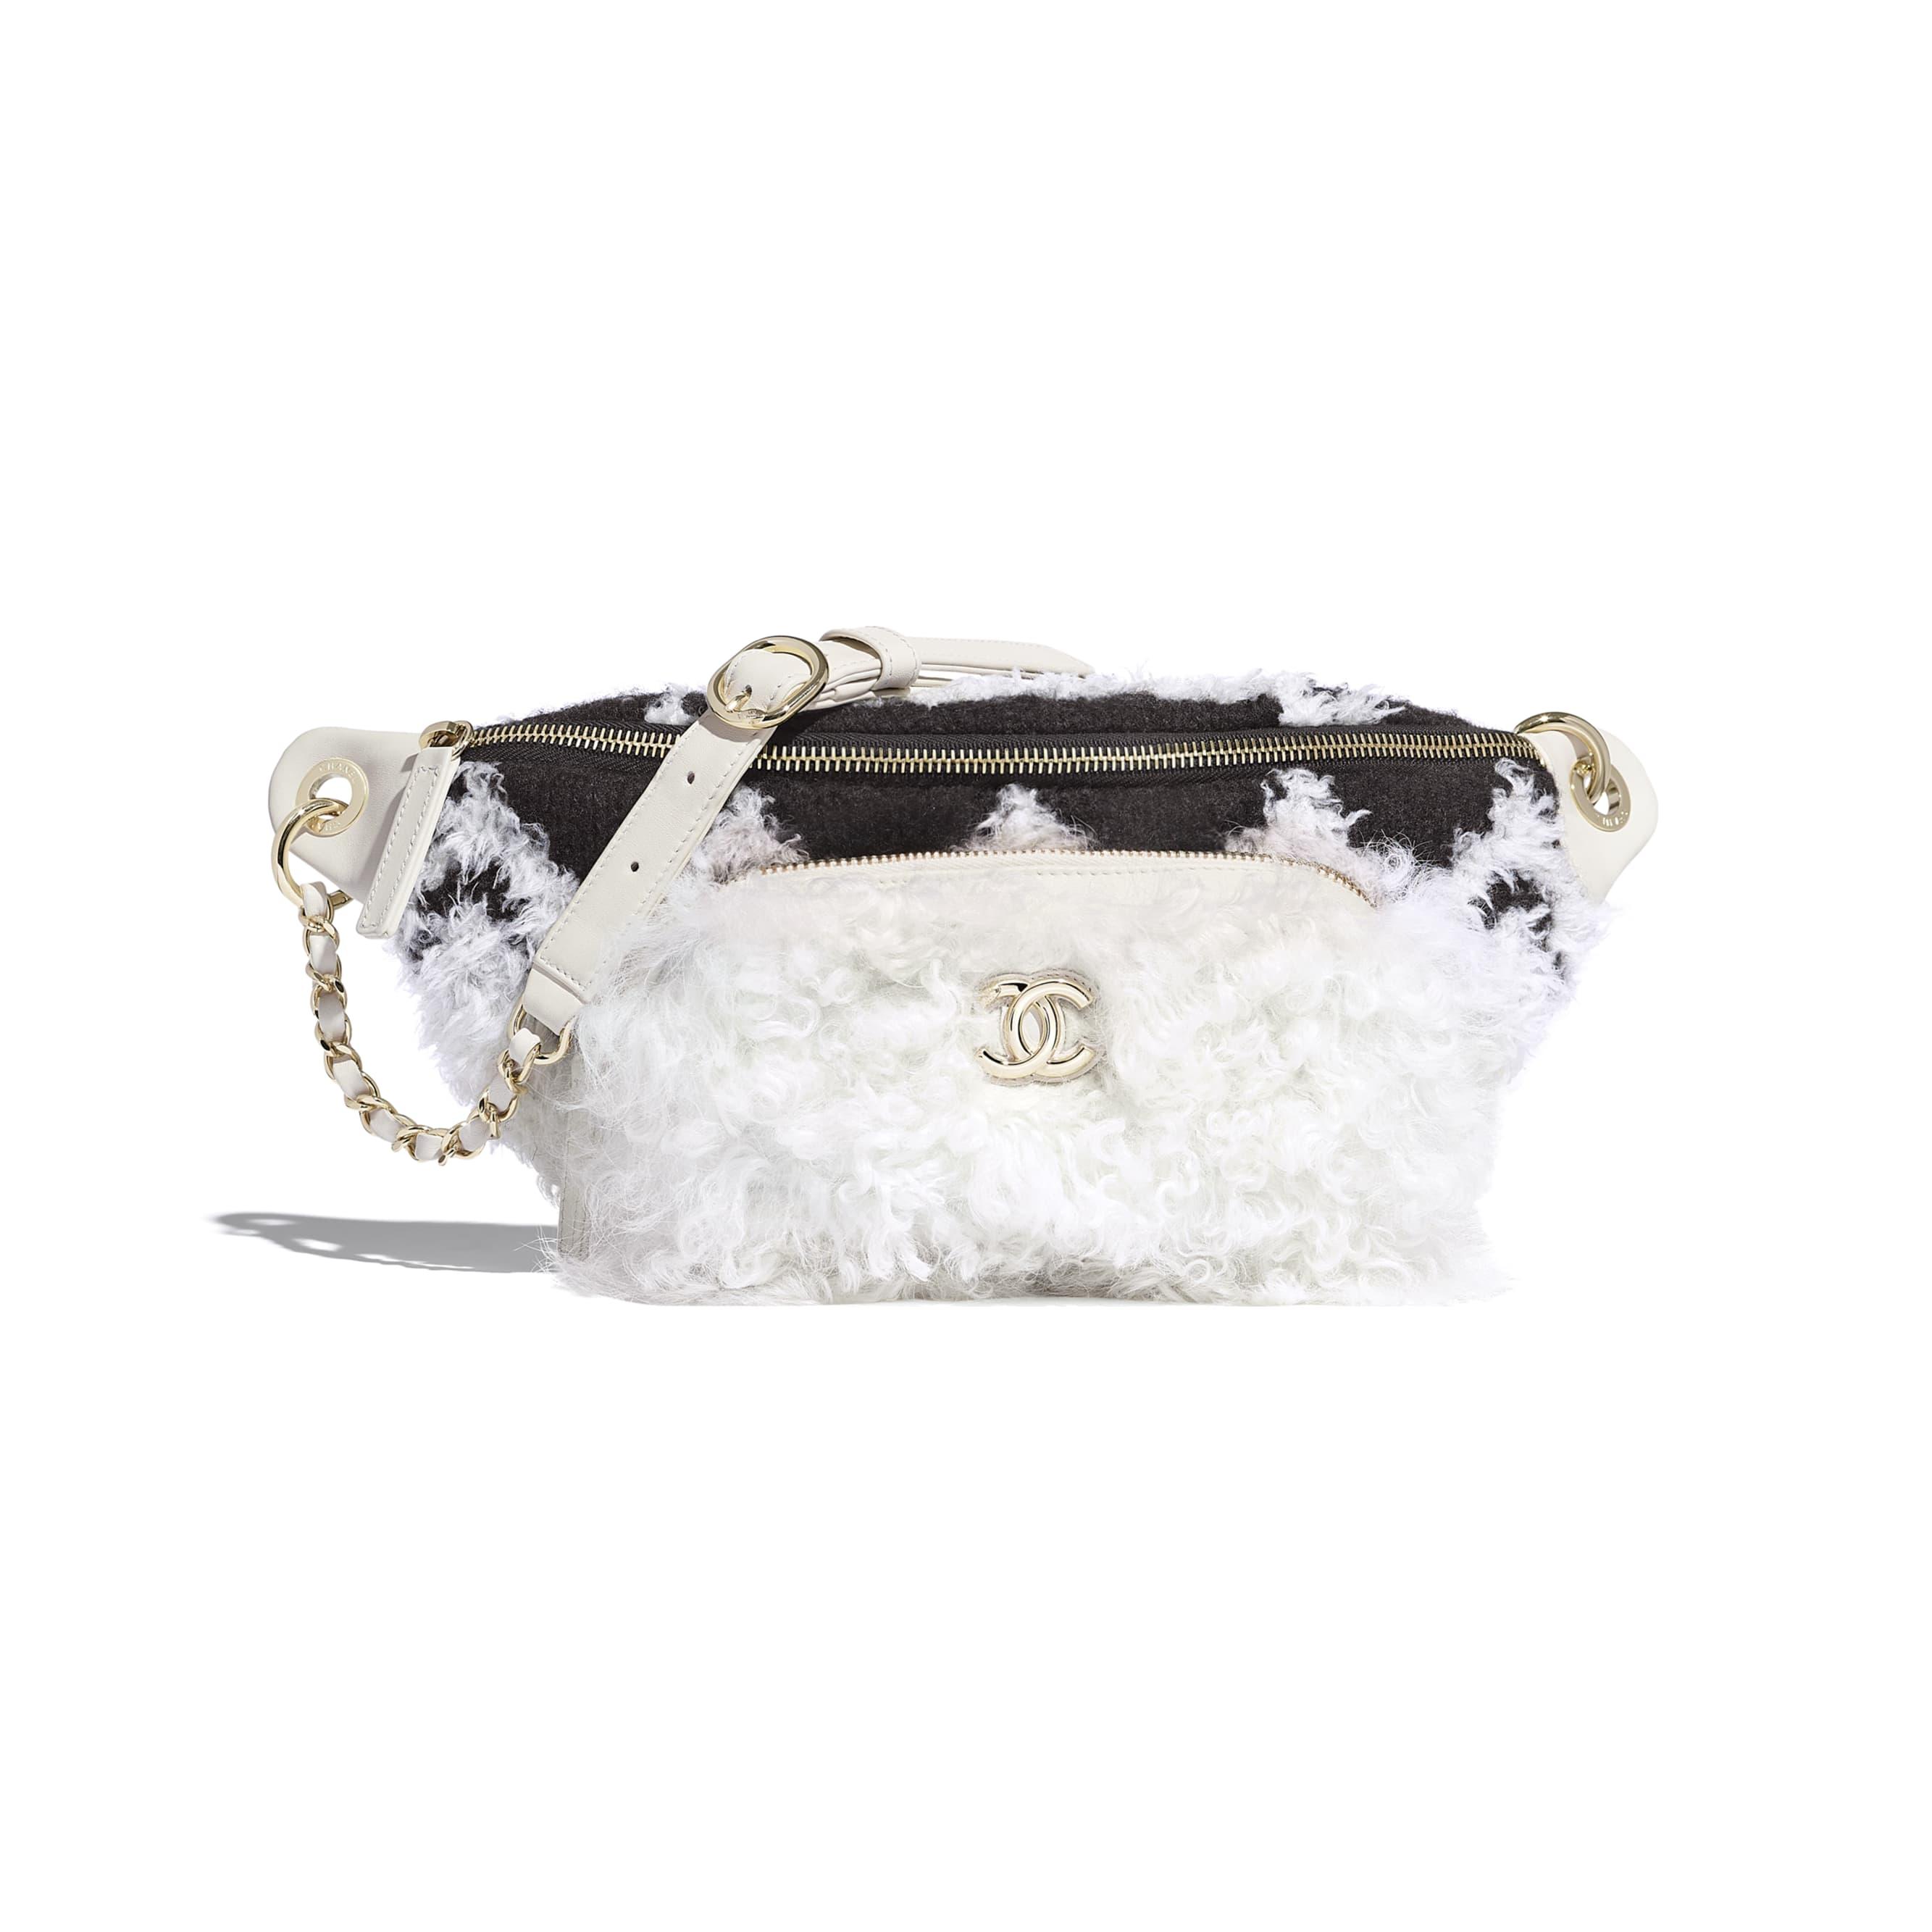 Waist Bag - White & Black - Wool, Shearling Sheepskin & Gold-Tone Metal - Default view - see standard sized version